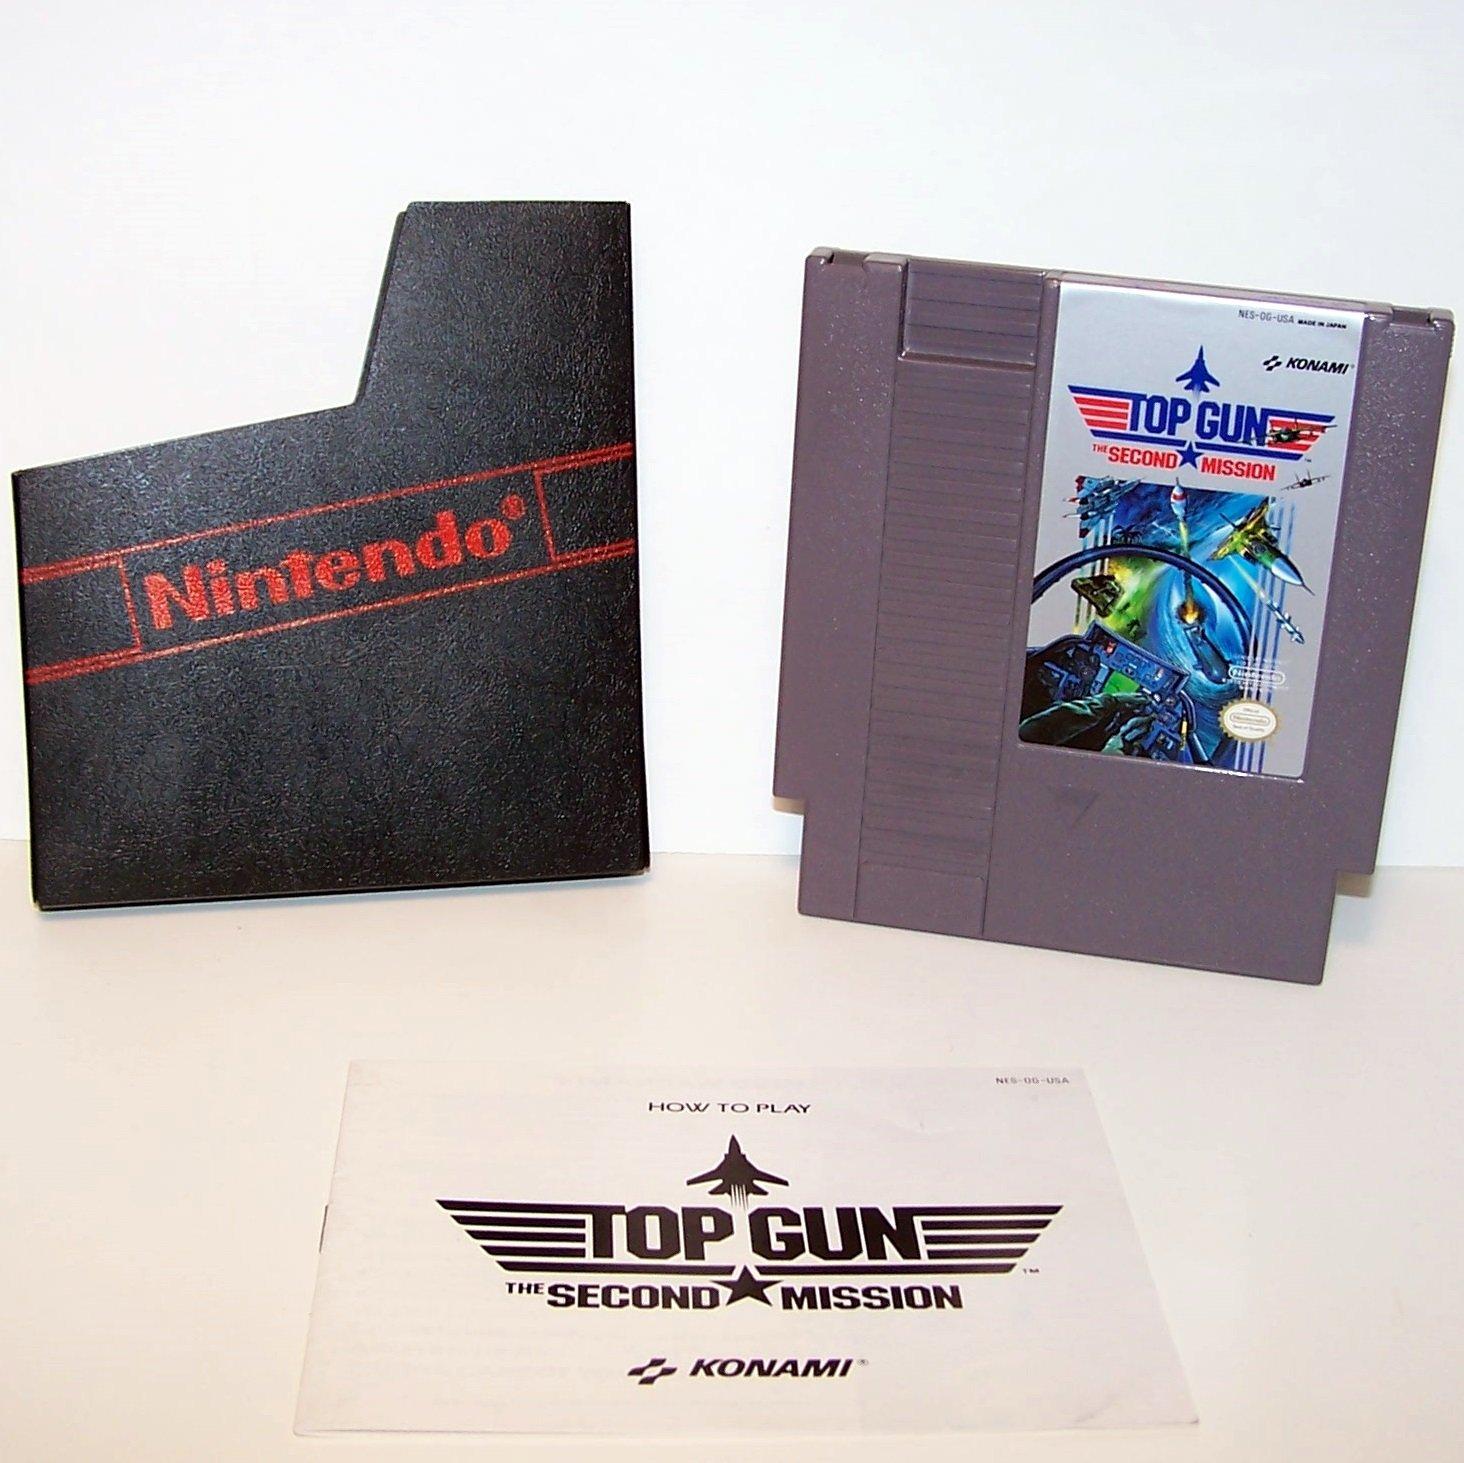 TOP GUN Second Mission ~ Original 8-bit Nintendo NES Game Cartridge with instructions